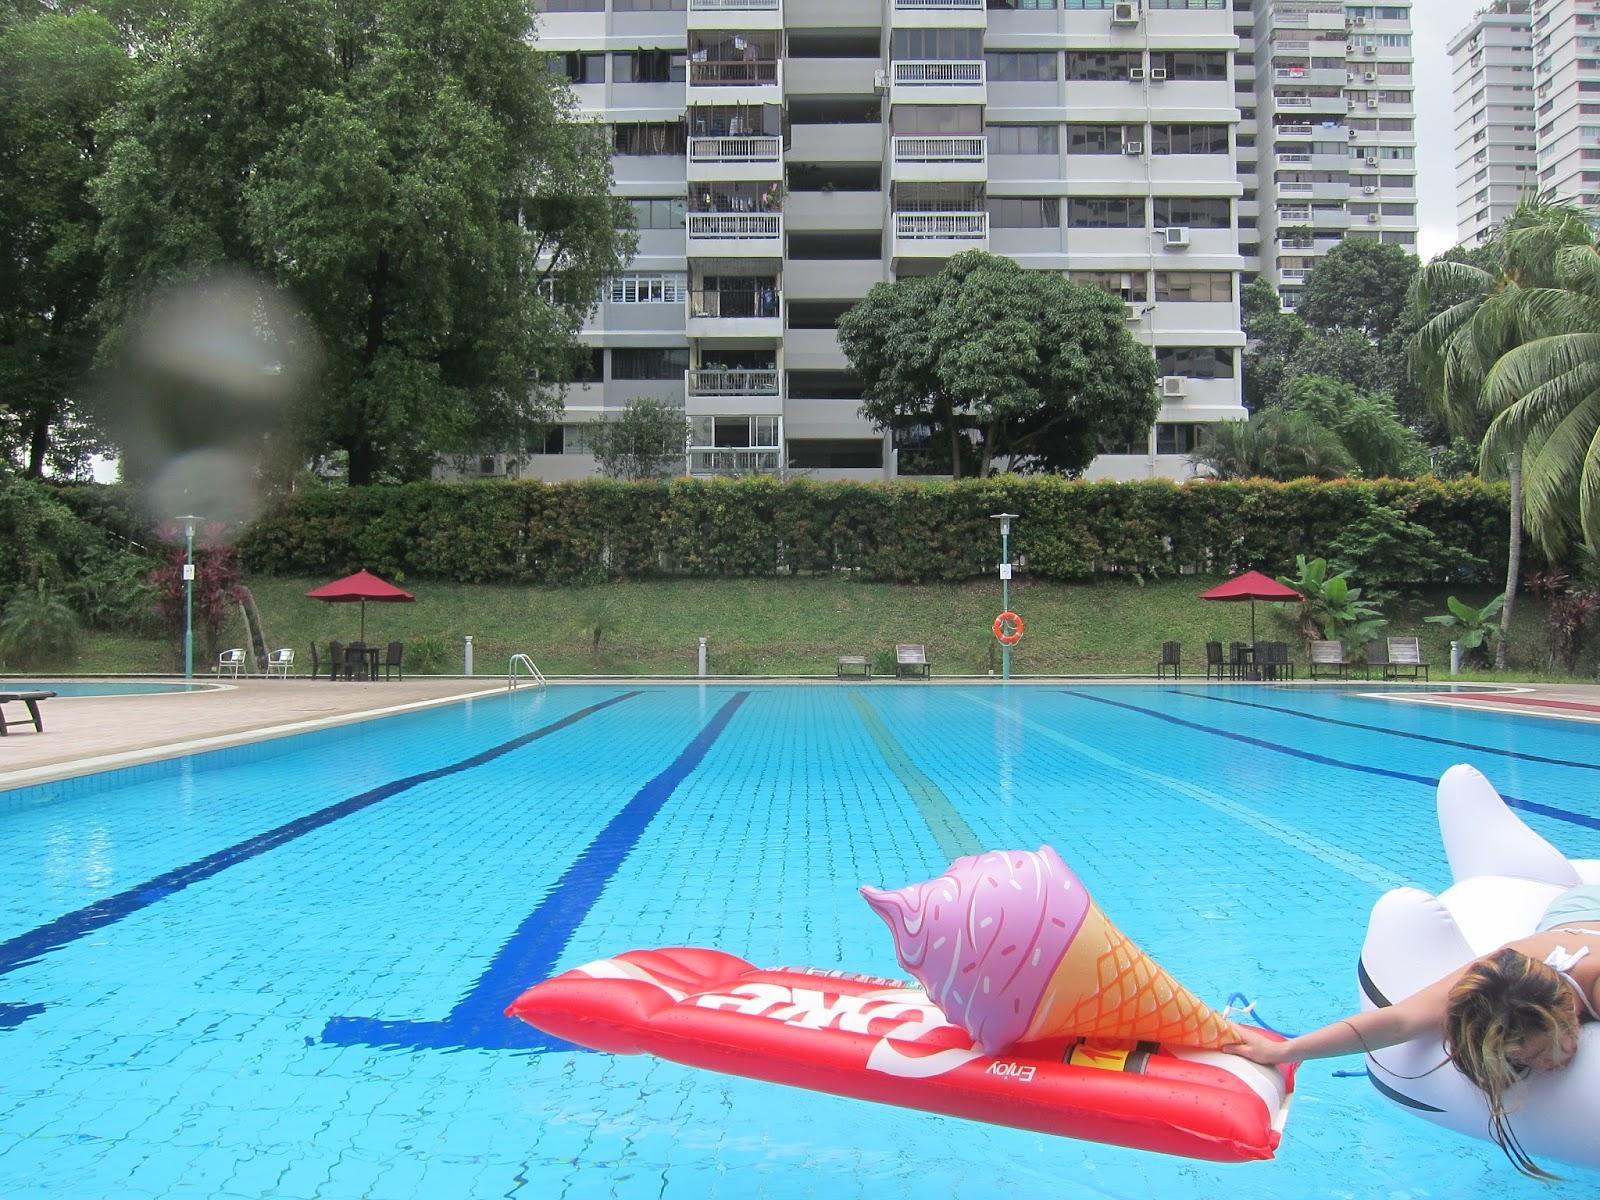 nadine floats